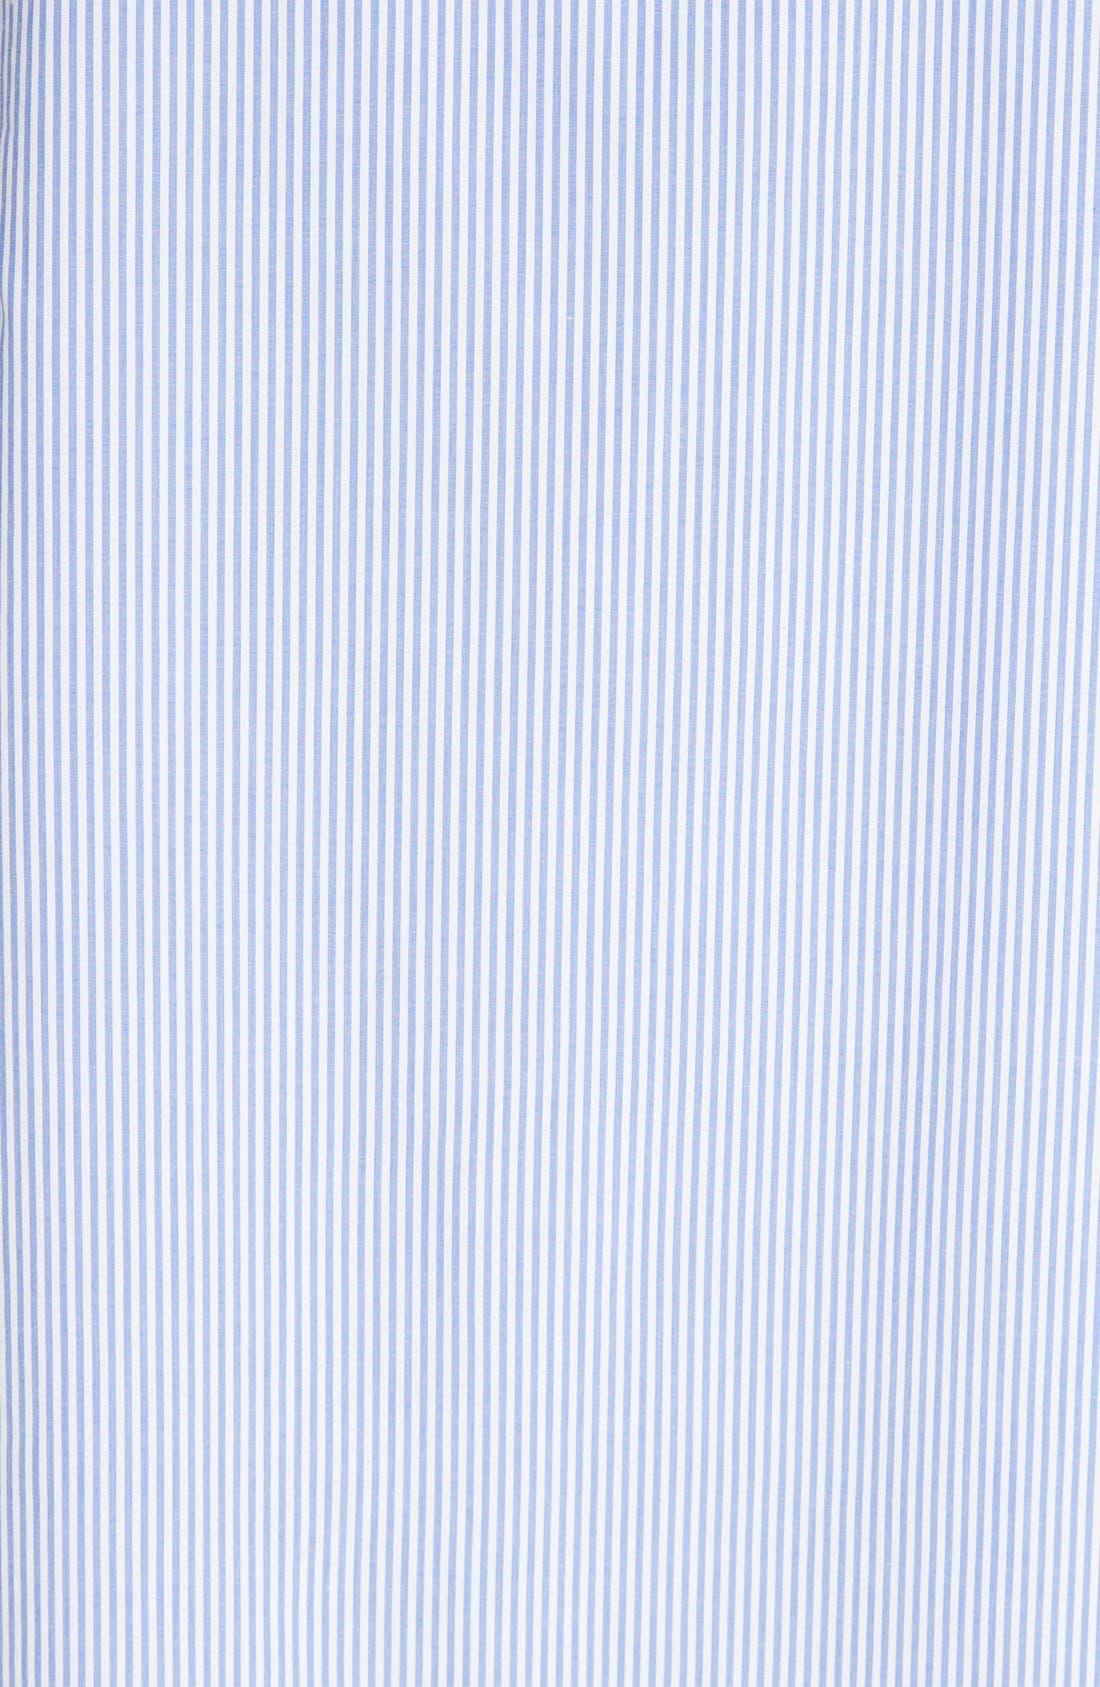 Elliot Stripe Trapeze Dress,                             Alternate thumbnail 3, color,                             400